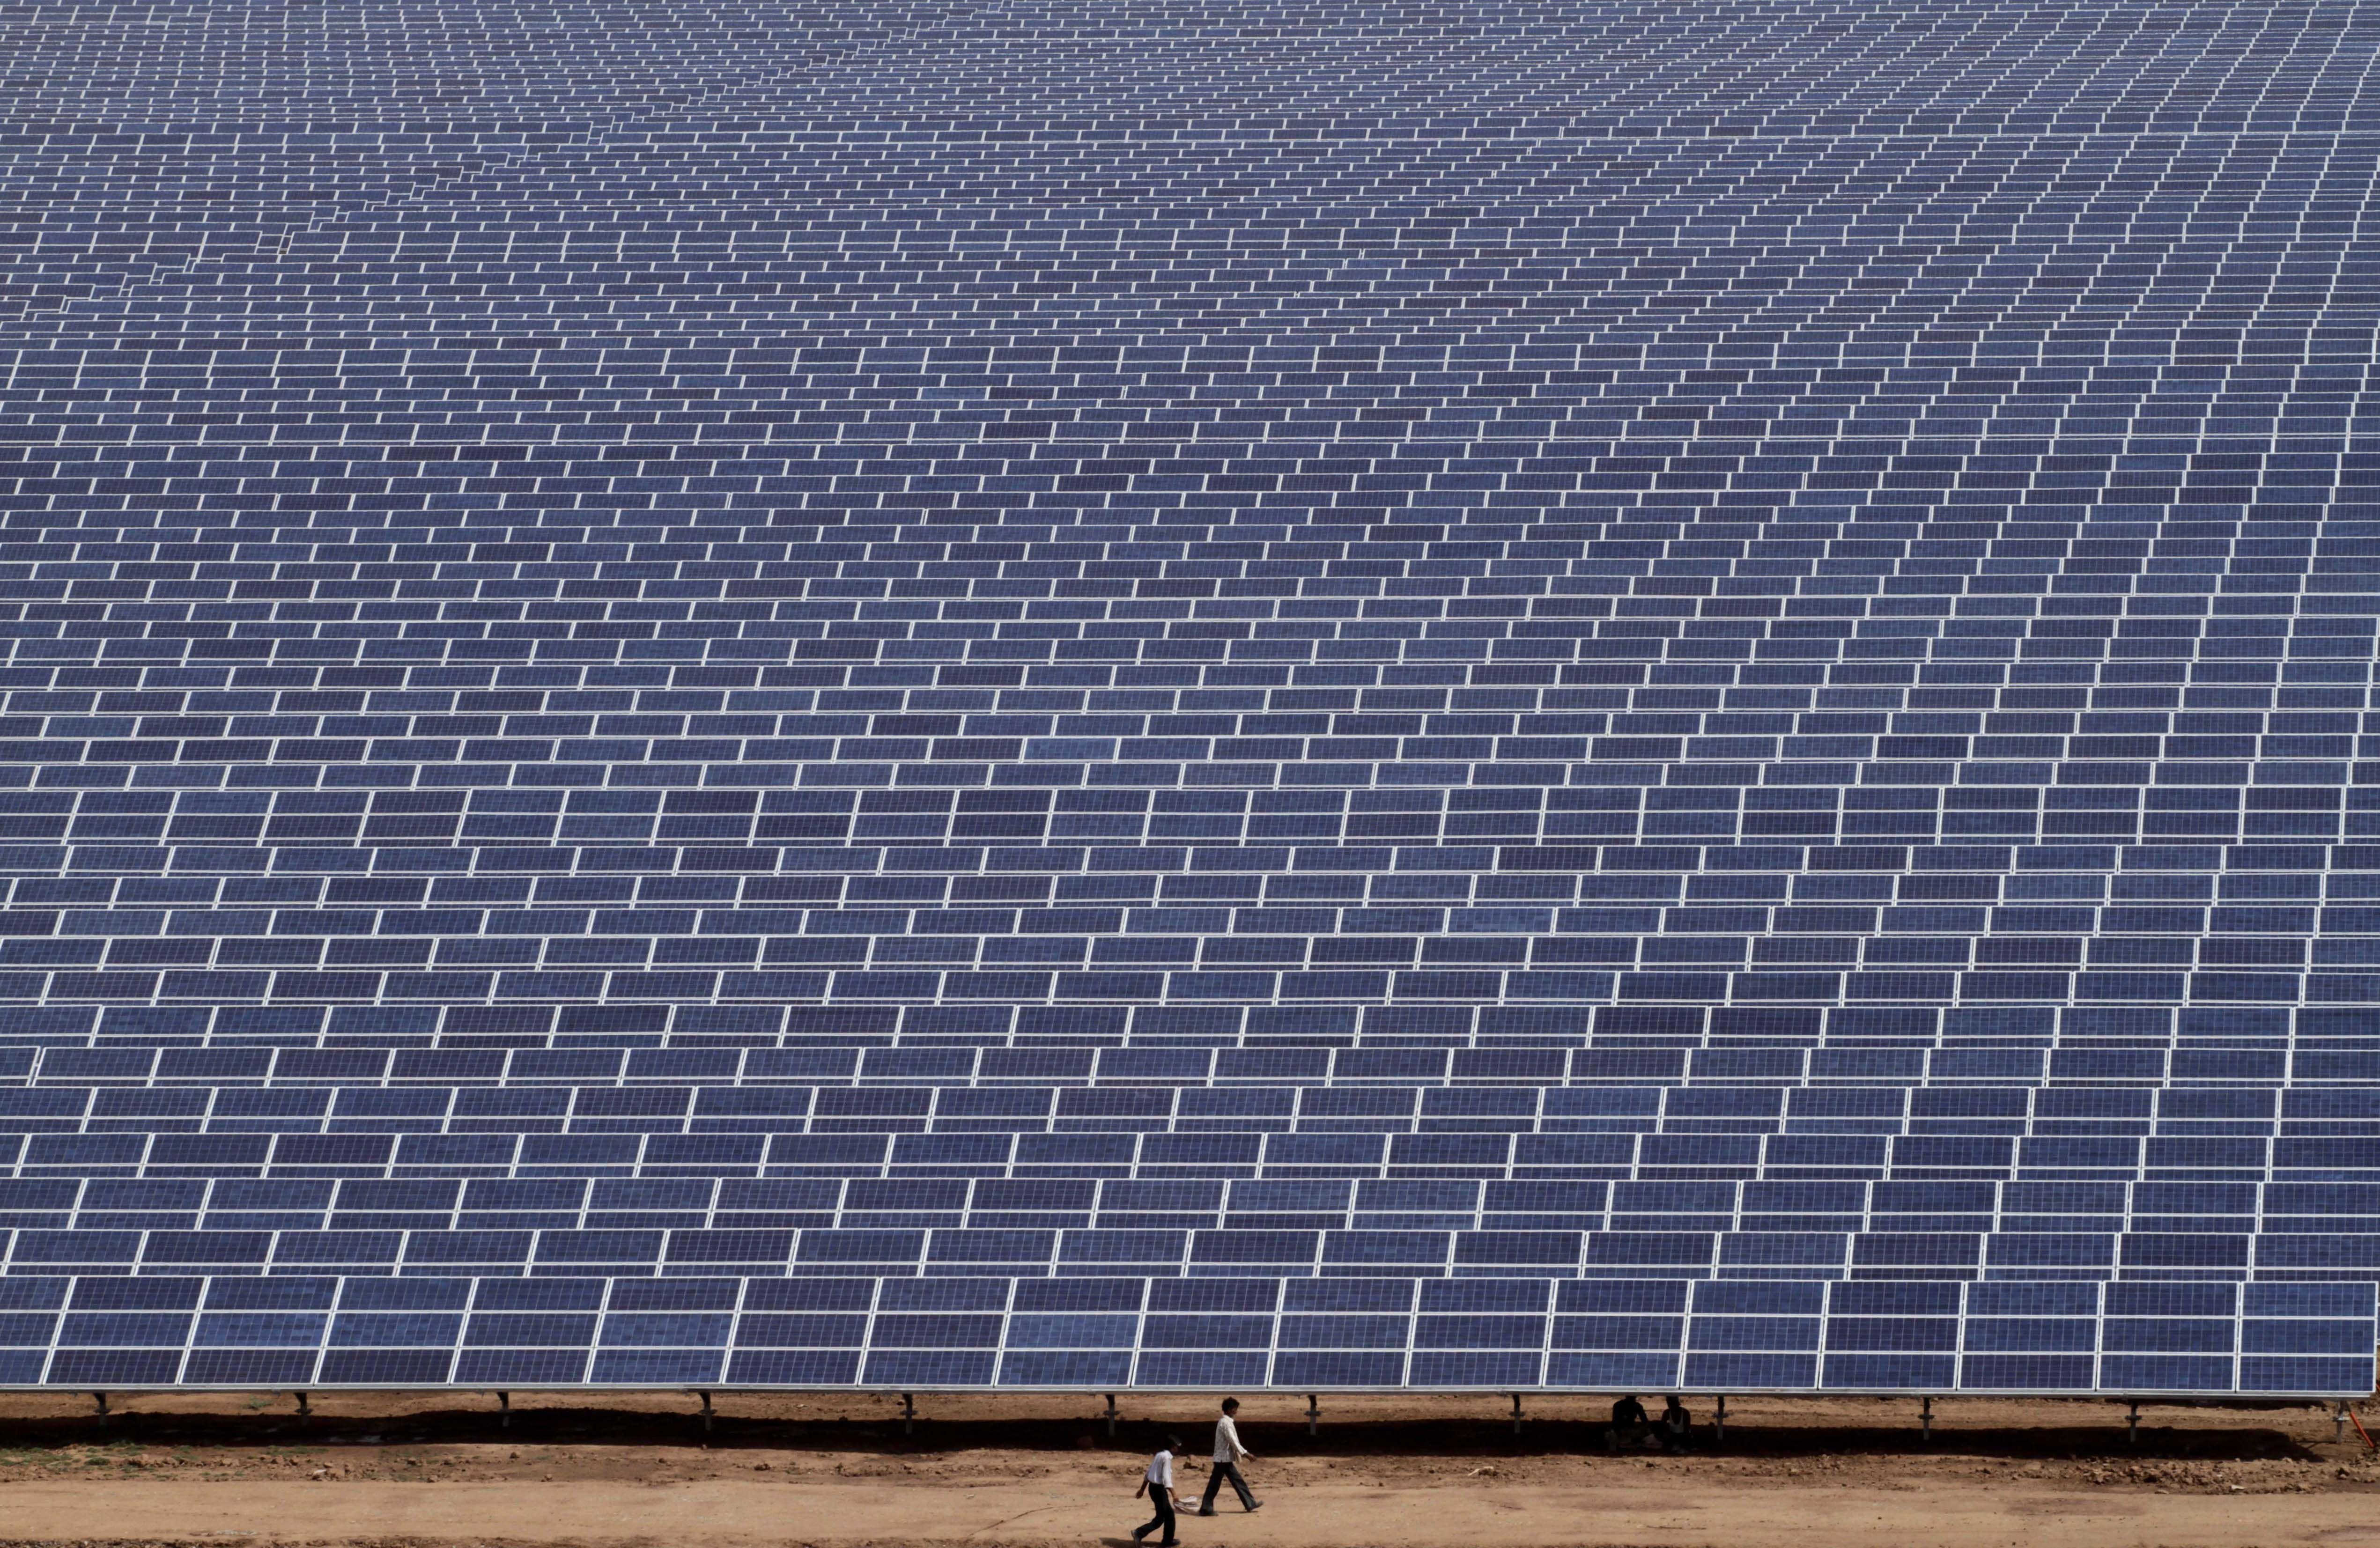 Need For Better Energy Gujarat Solar Park Gujarat India Solar Projects Solar Energy Renewable Solar